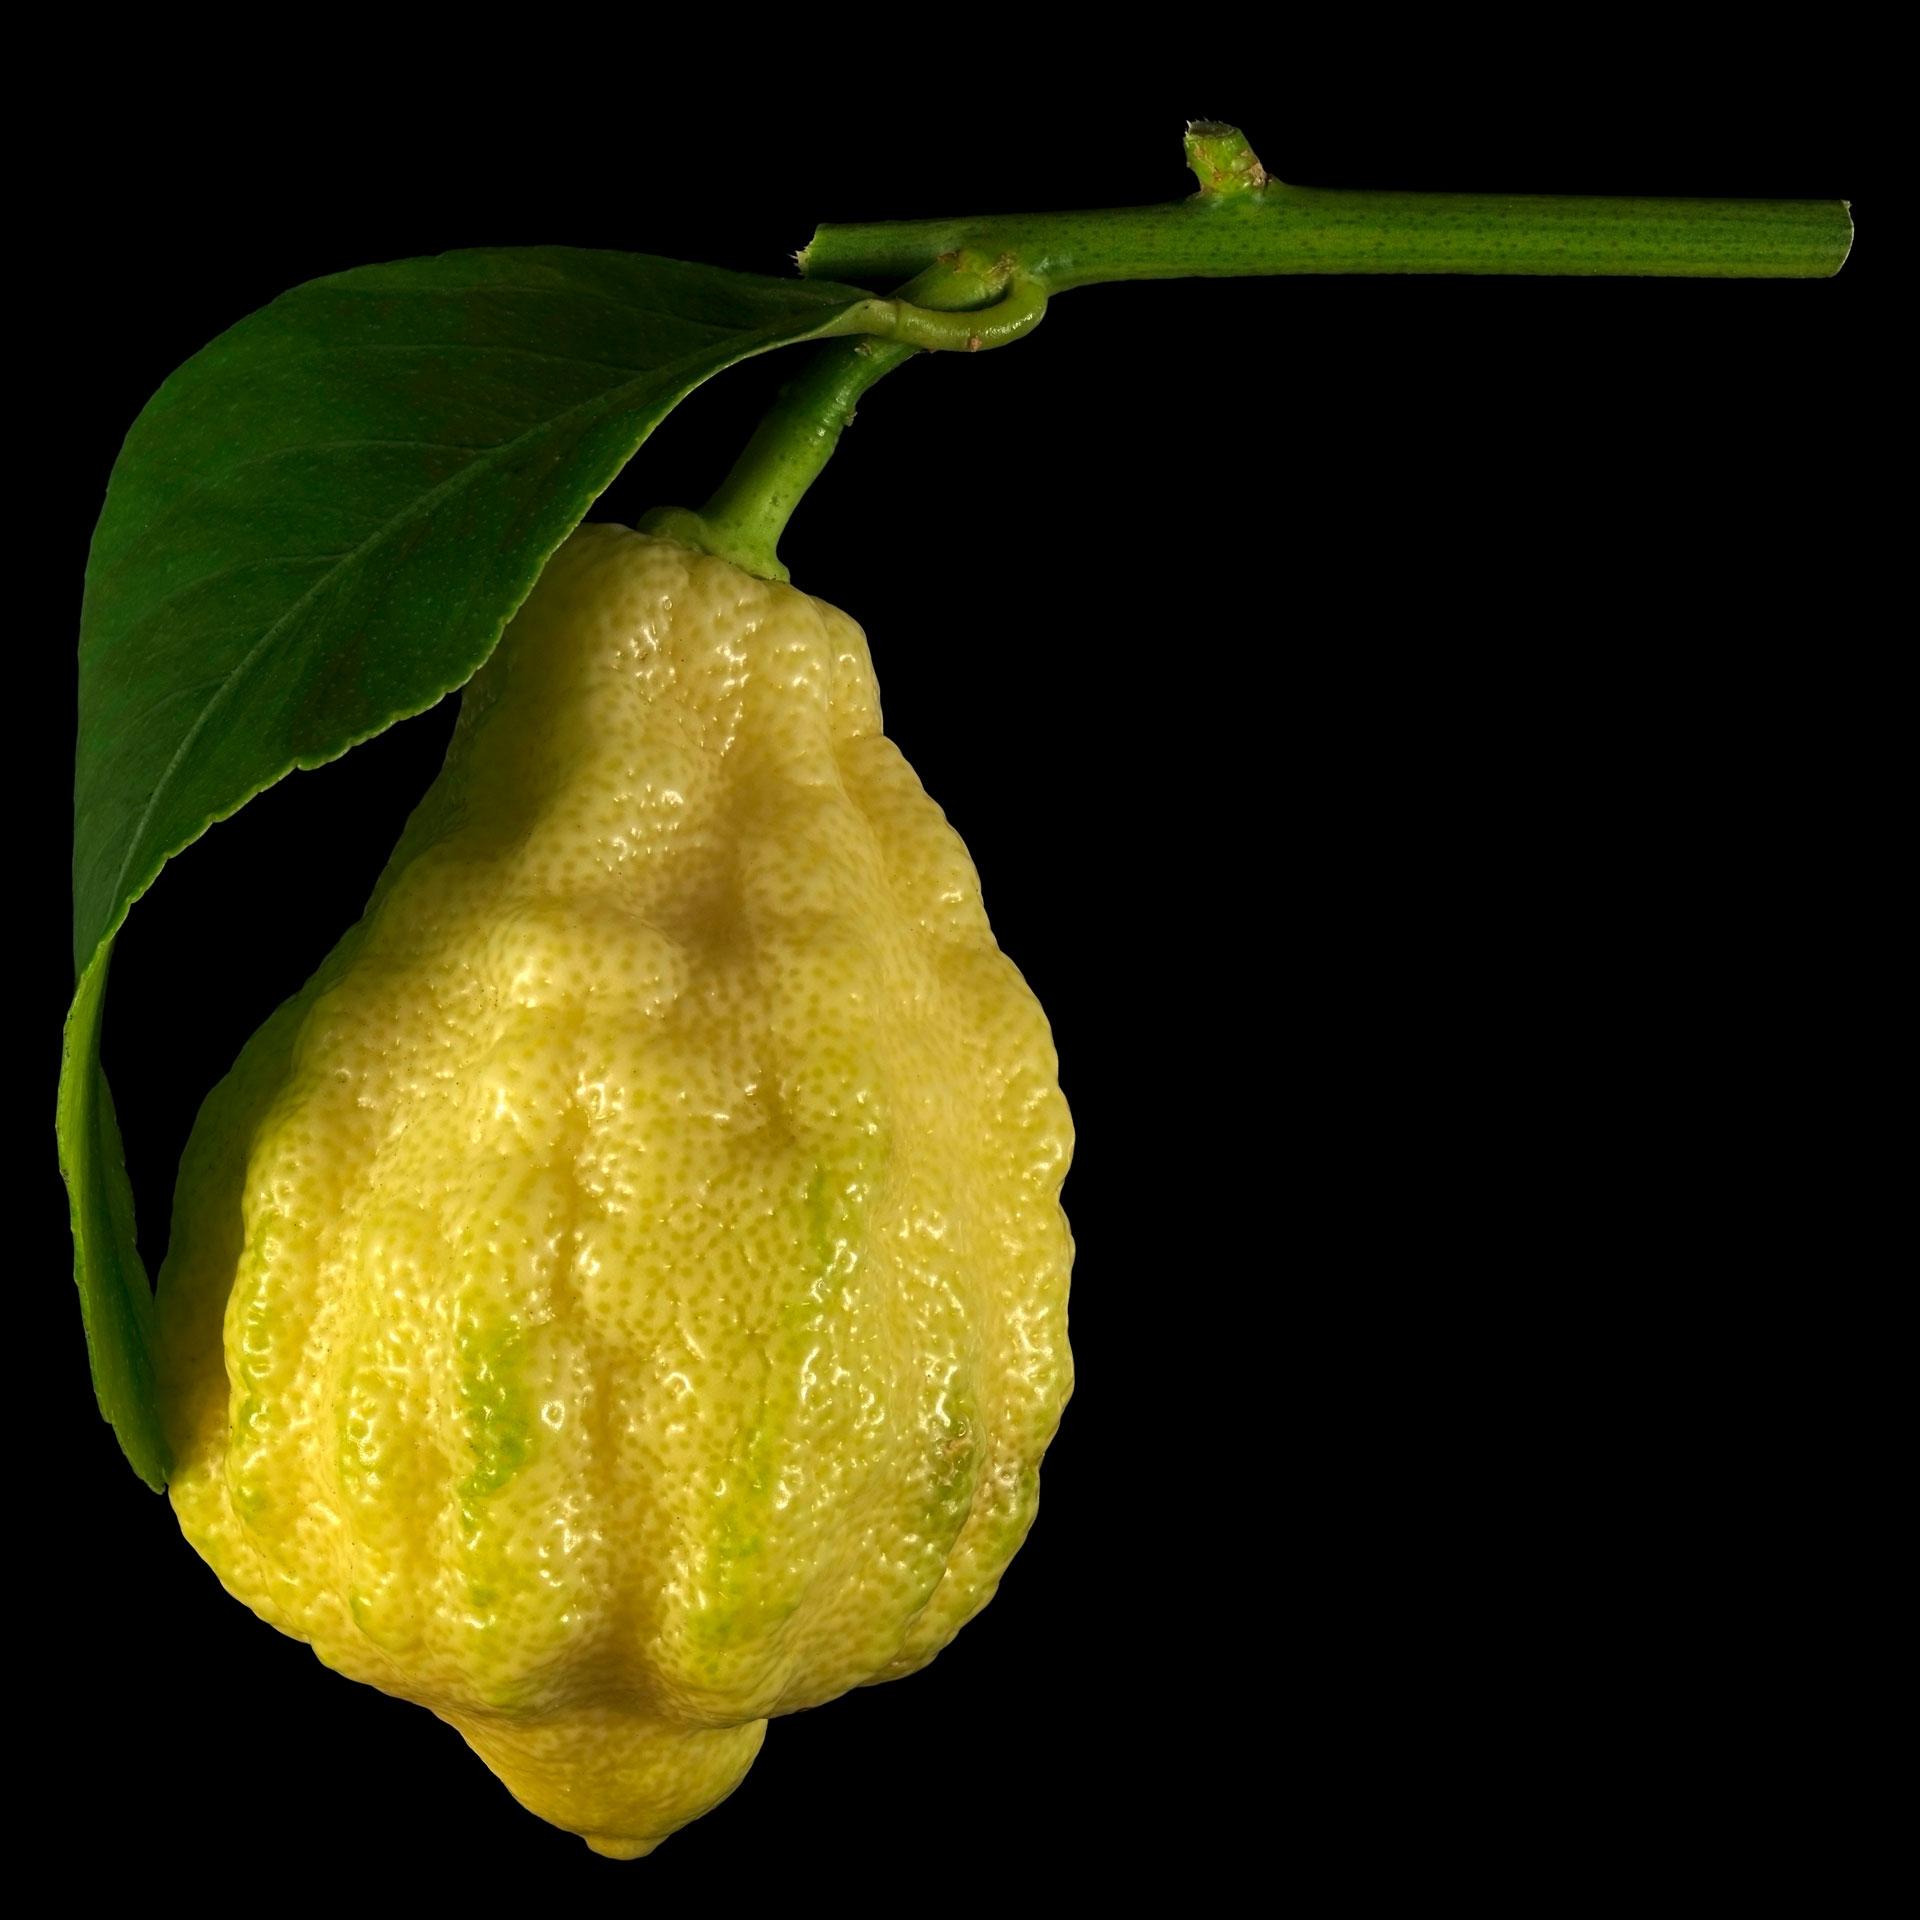 die gefurchte zitrone citrus limon canaliculata flora obscura. Black Bedroom Furniture Sets. Home Design Ideas